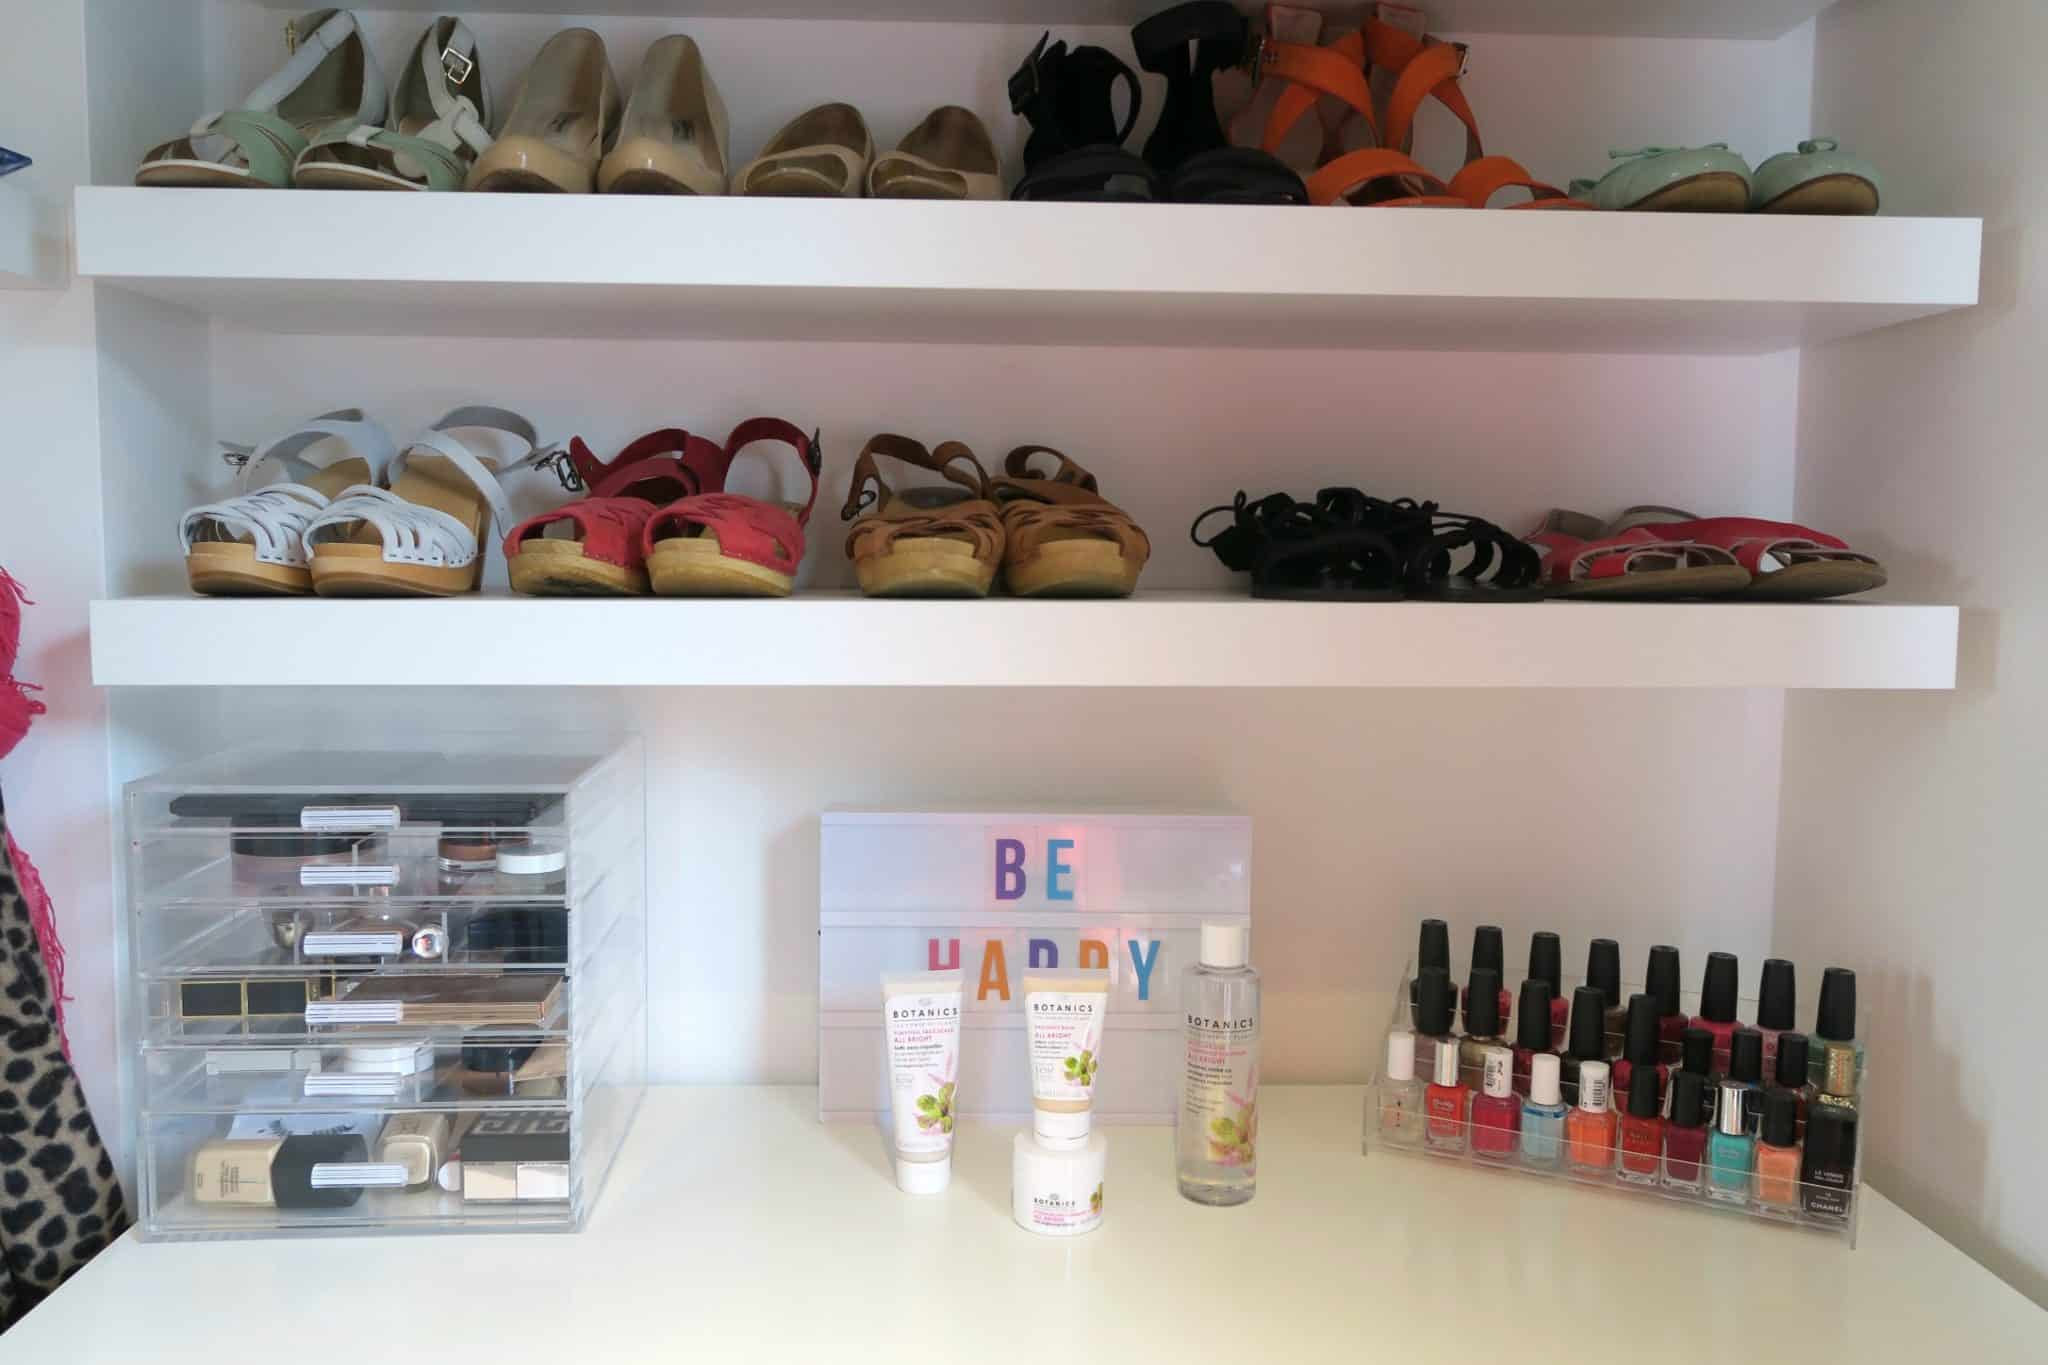 My daytime skincare routine with Boots Botanics All Bright range